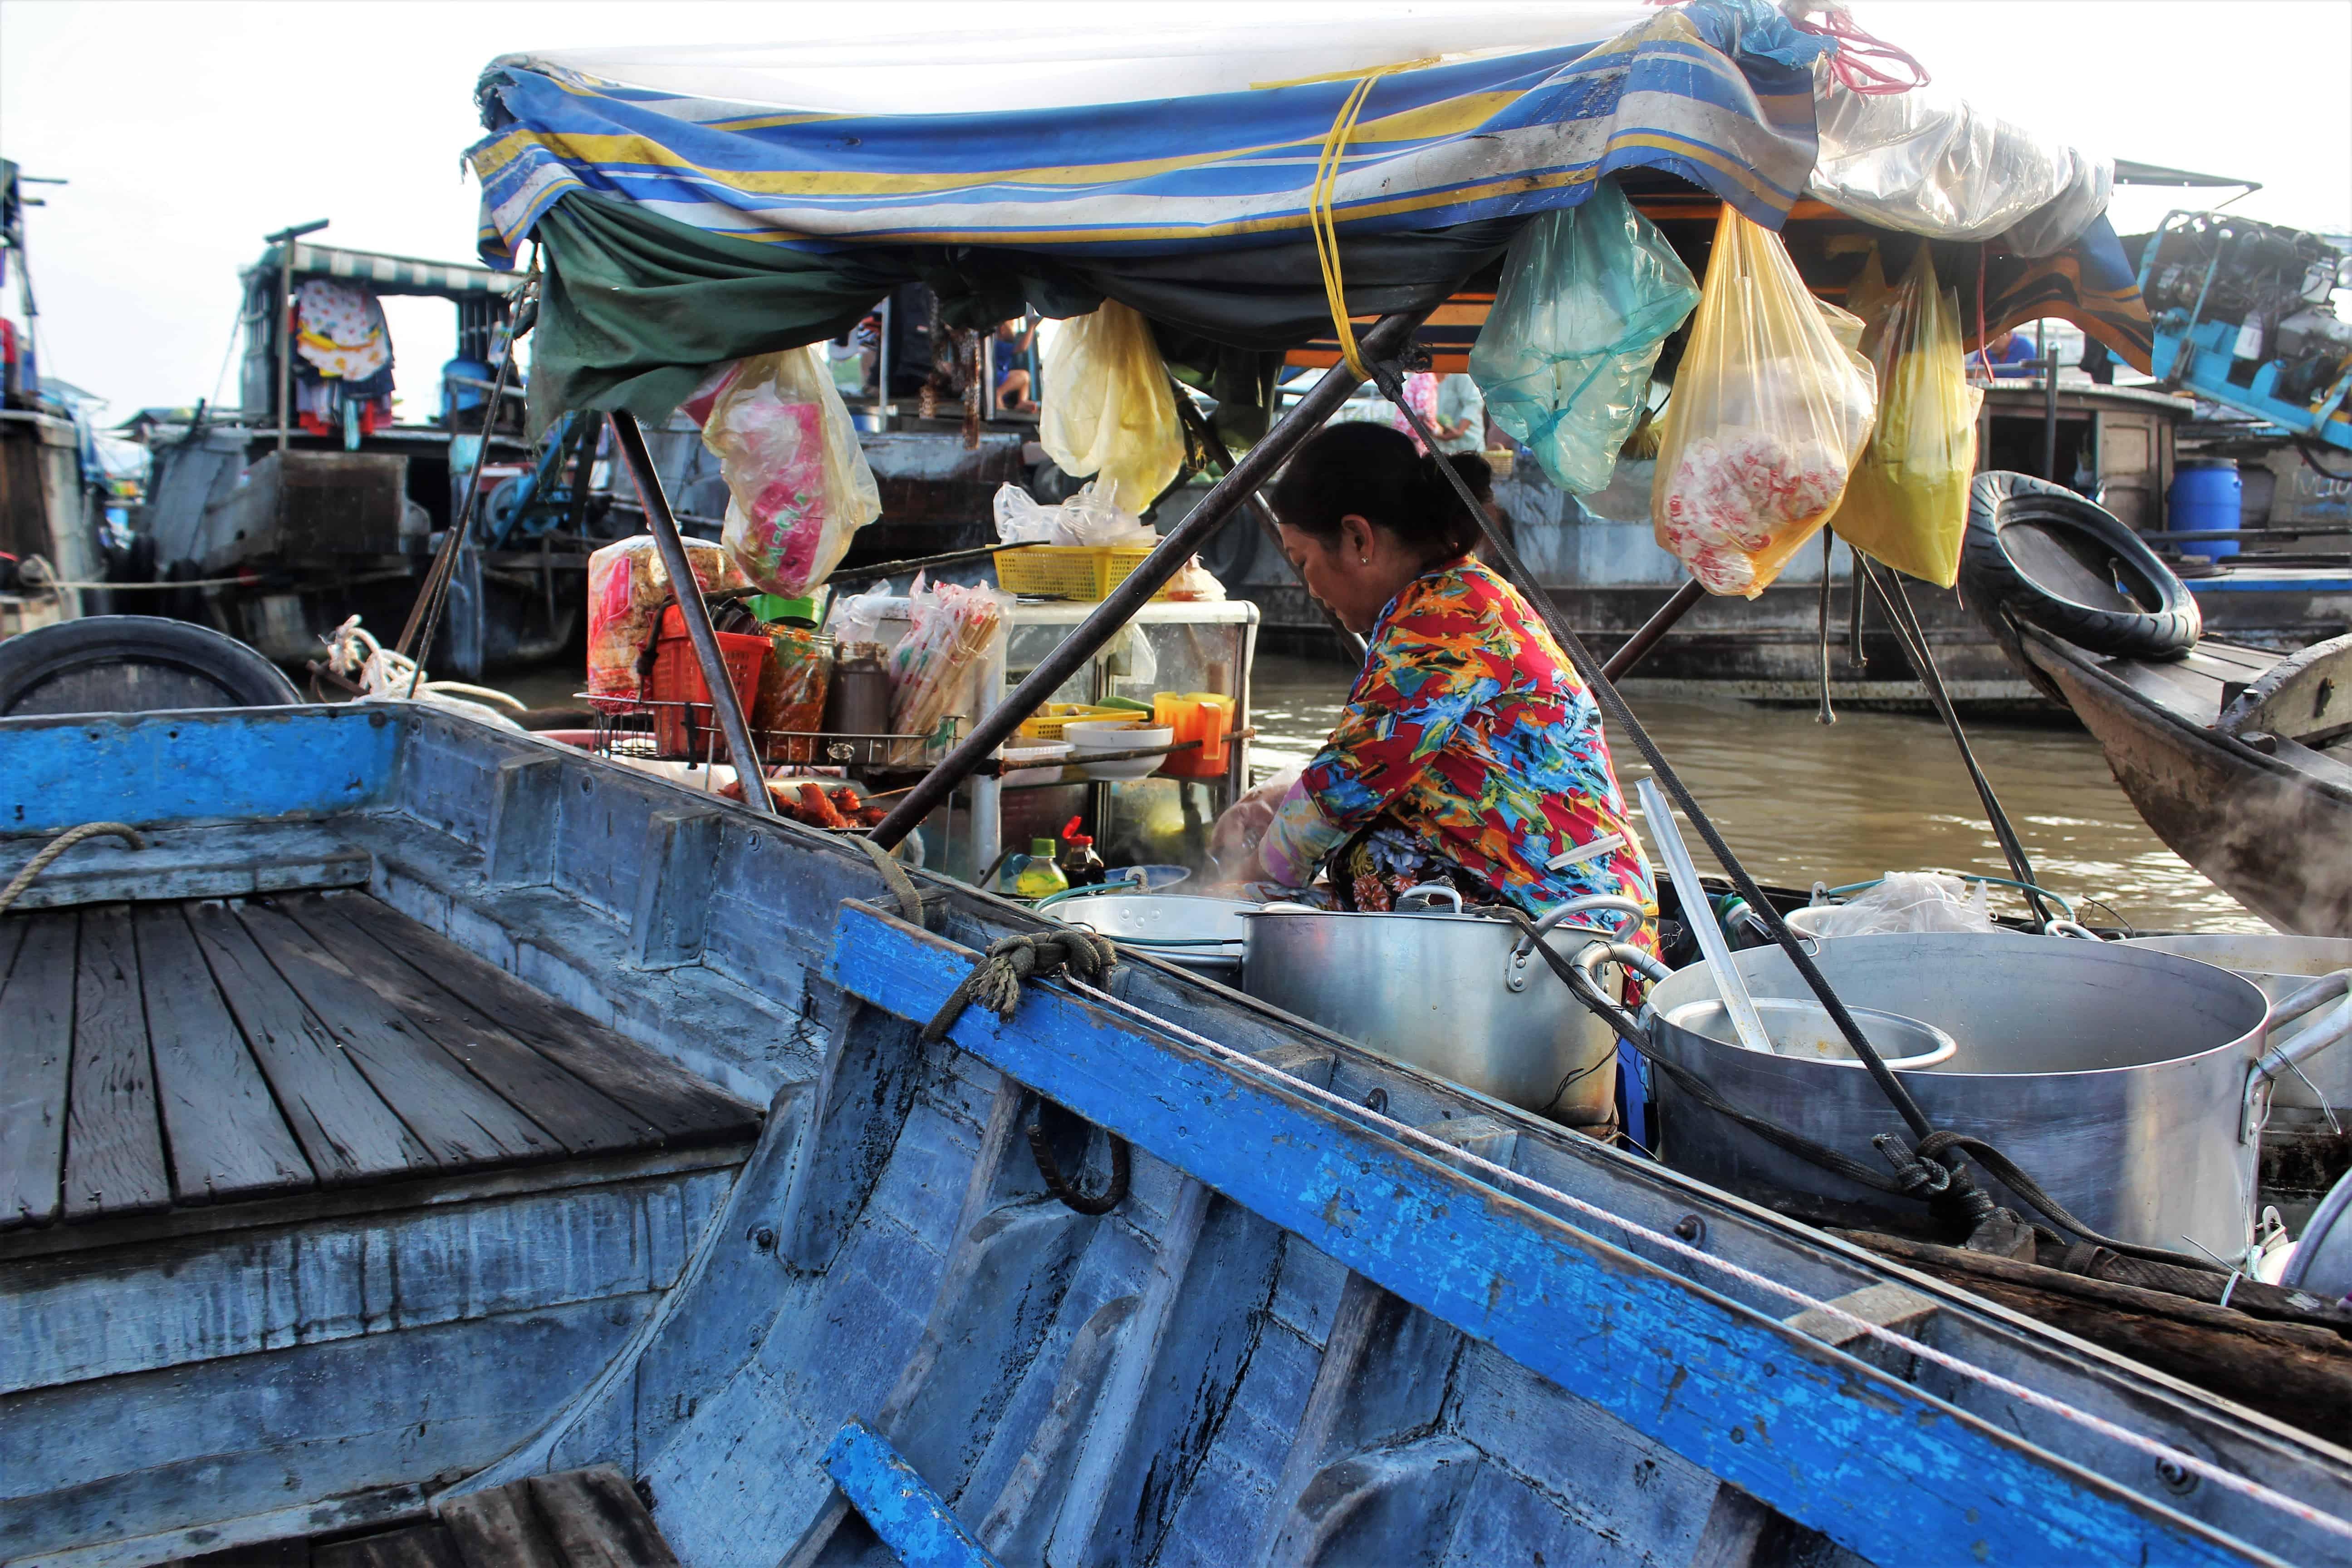 Wietnam pływający targ Phong Diem